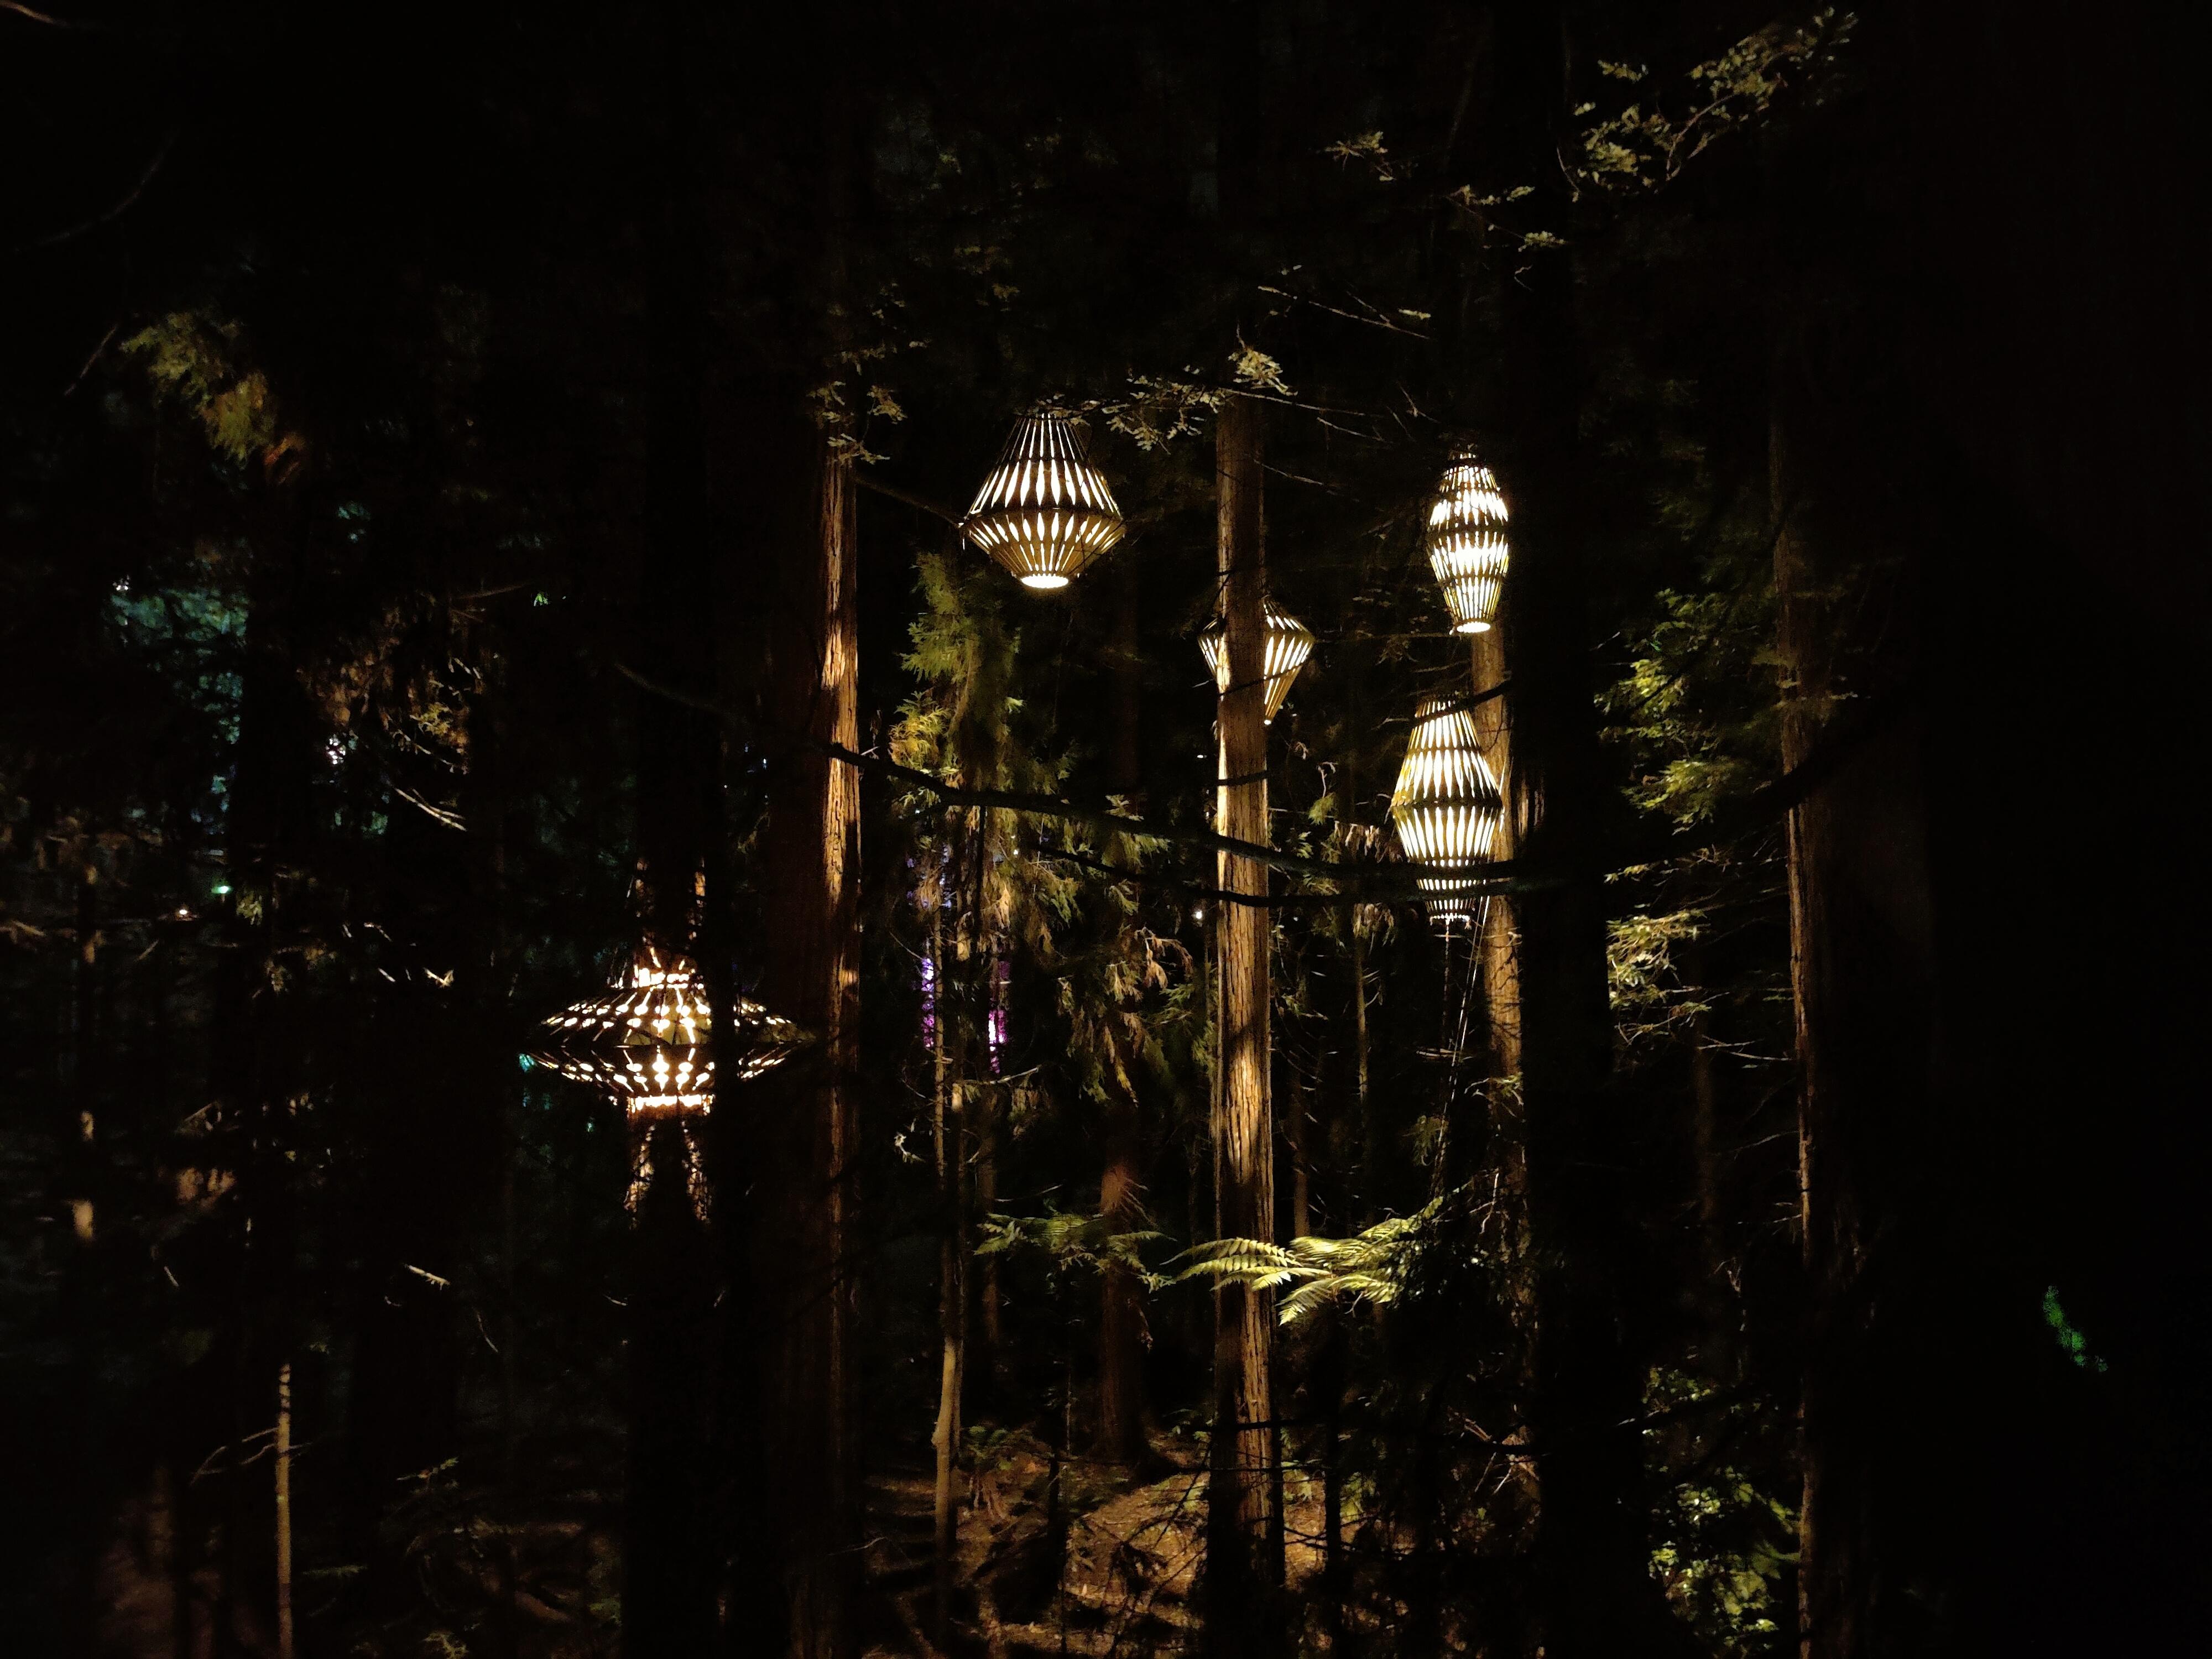 Lanterns on the Rotorua Redwoods Treewalk at night